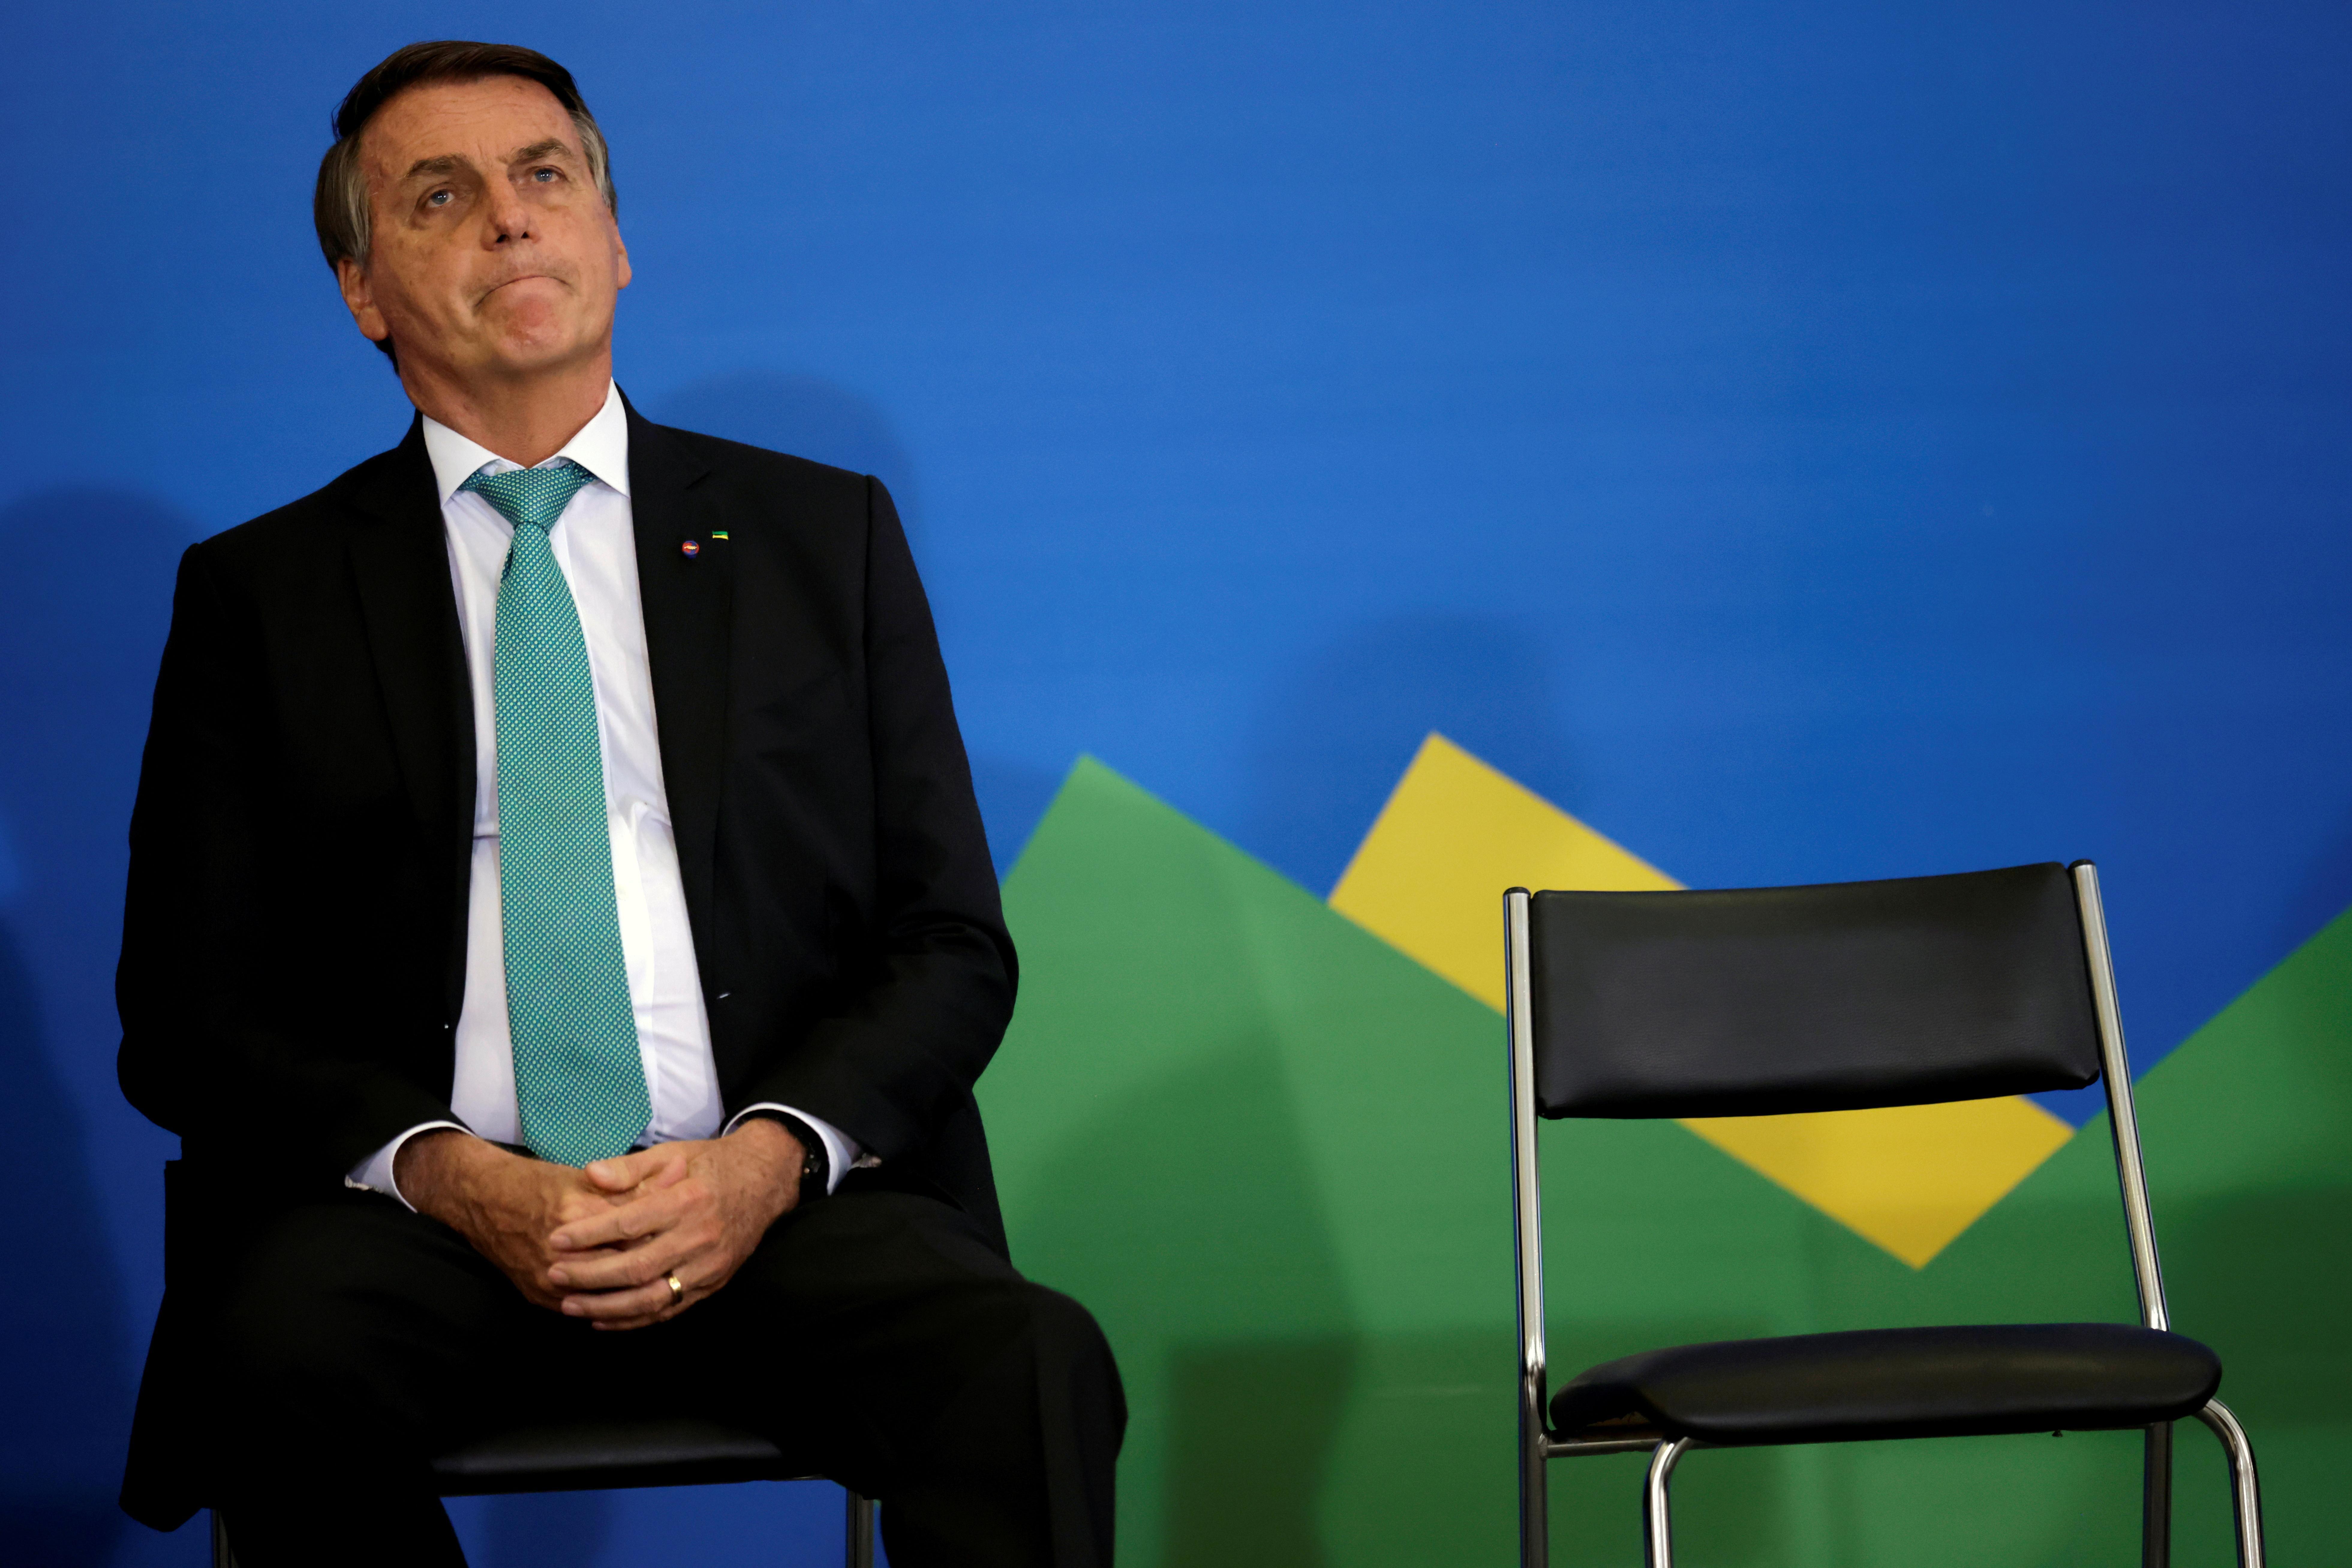 Brazil's President Jair Bolsonaro attends a ceremony to mark 1000 days in government at the Planalto Palace in Brasilia, Brazil September 27, 2021.